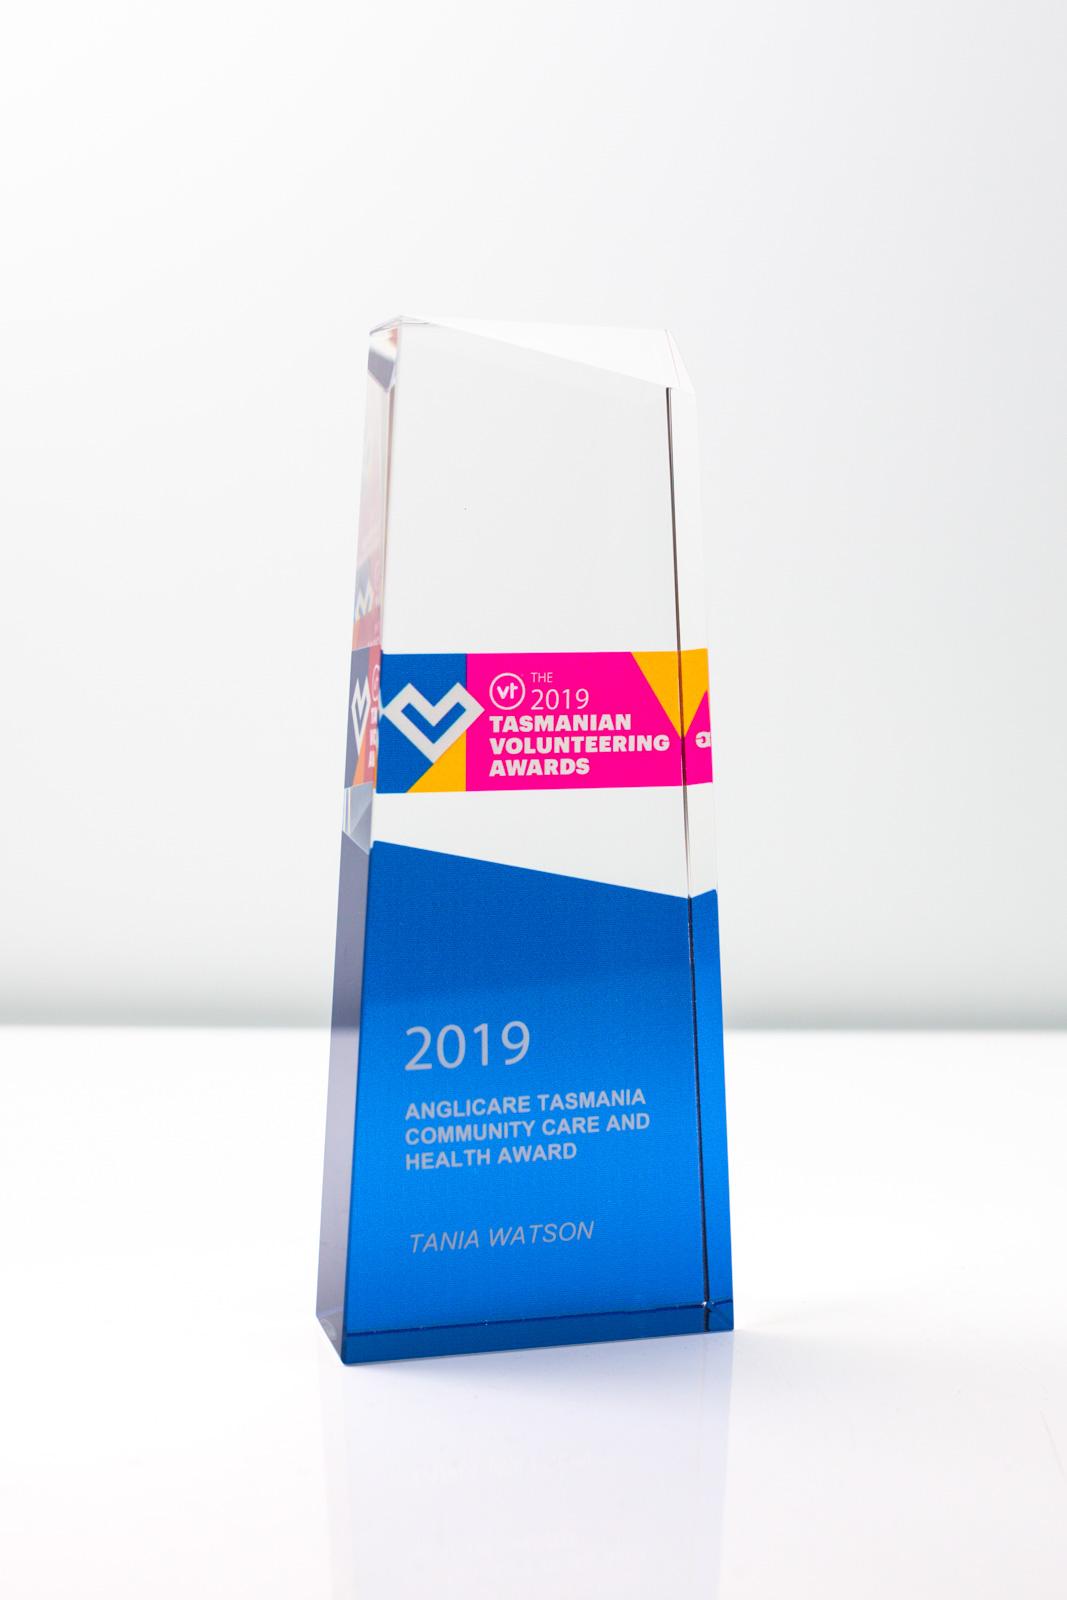 Tasmanian Volunteering Awards Crystal